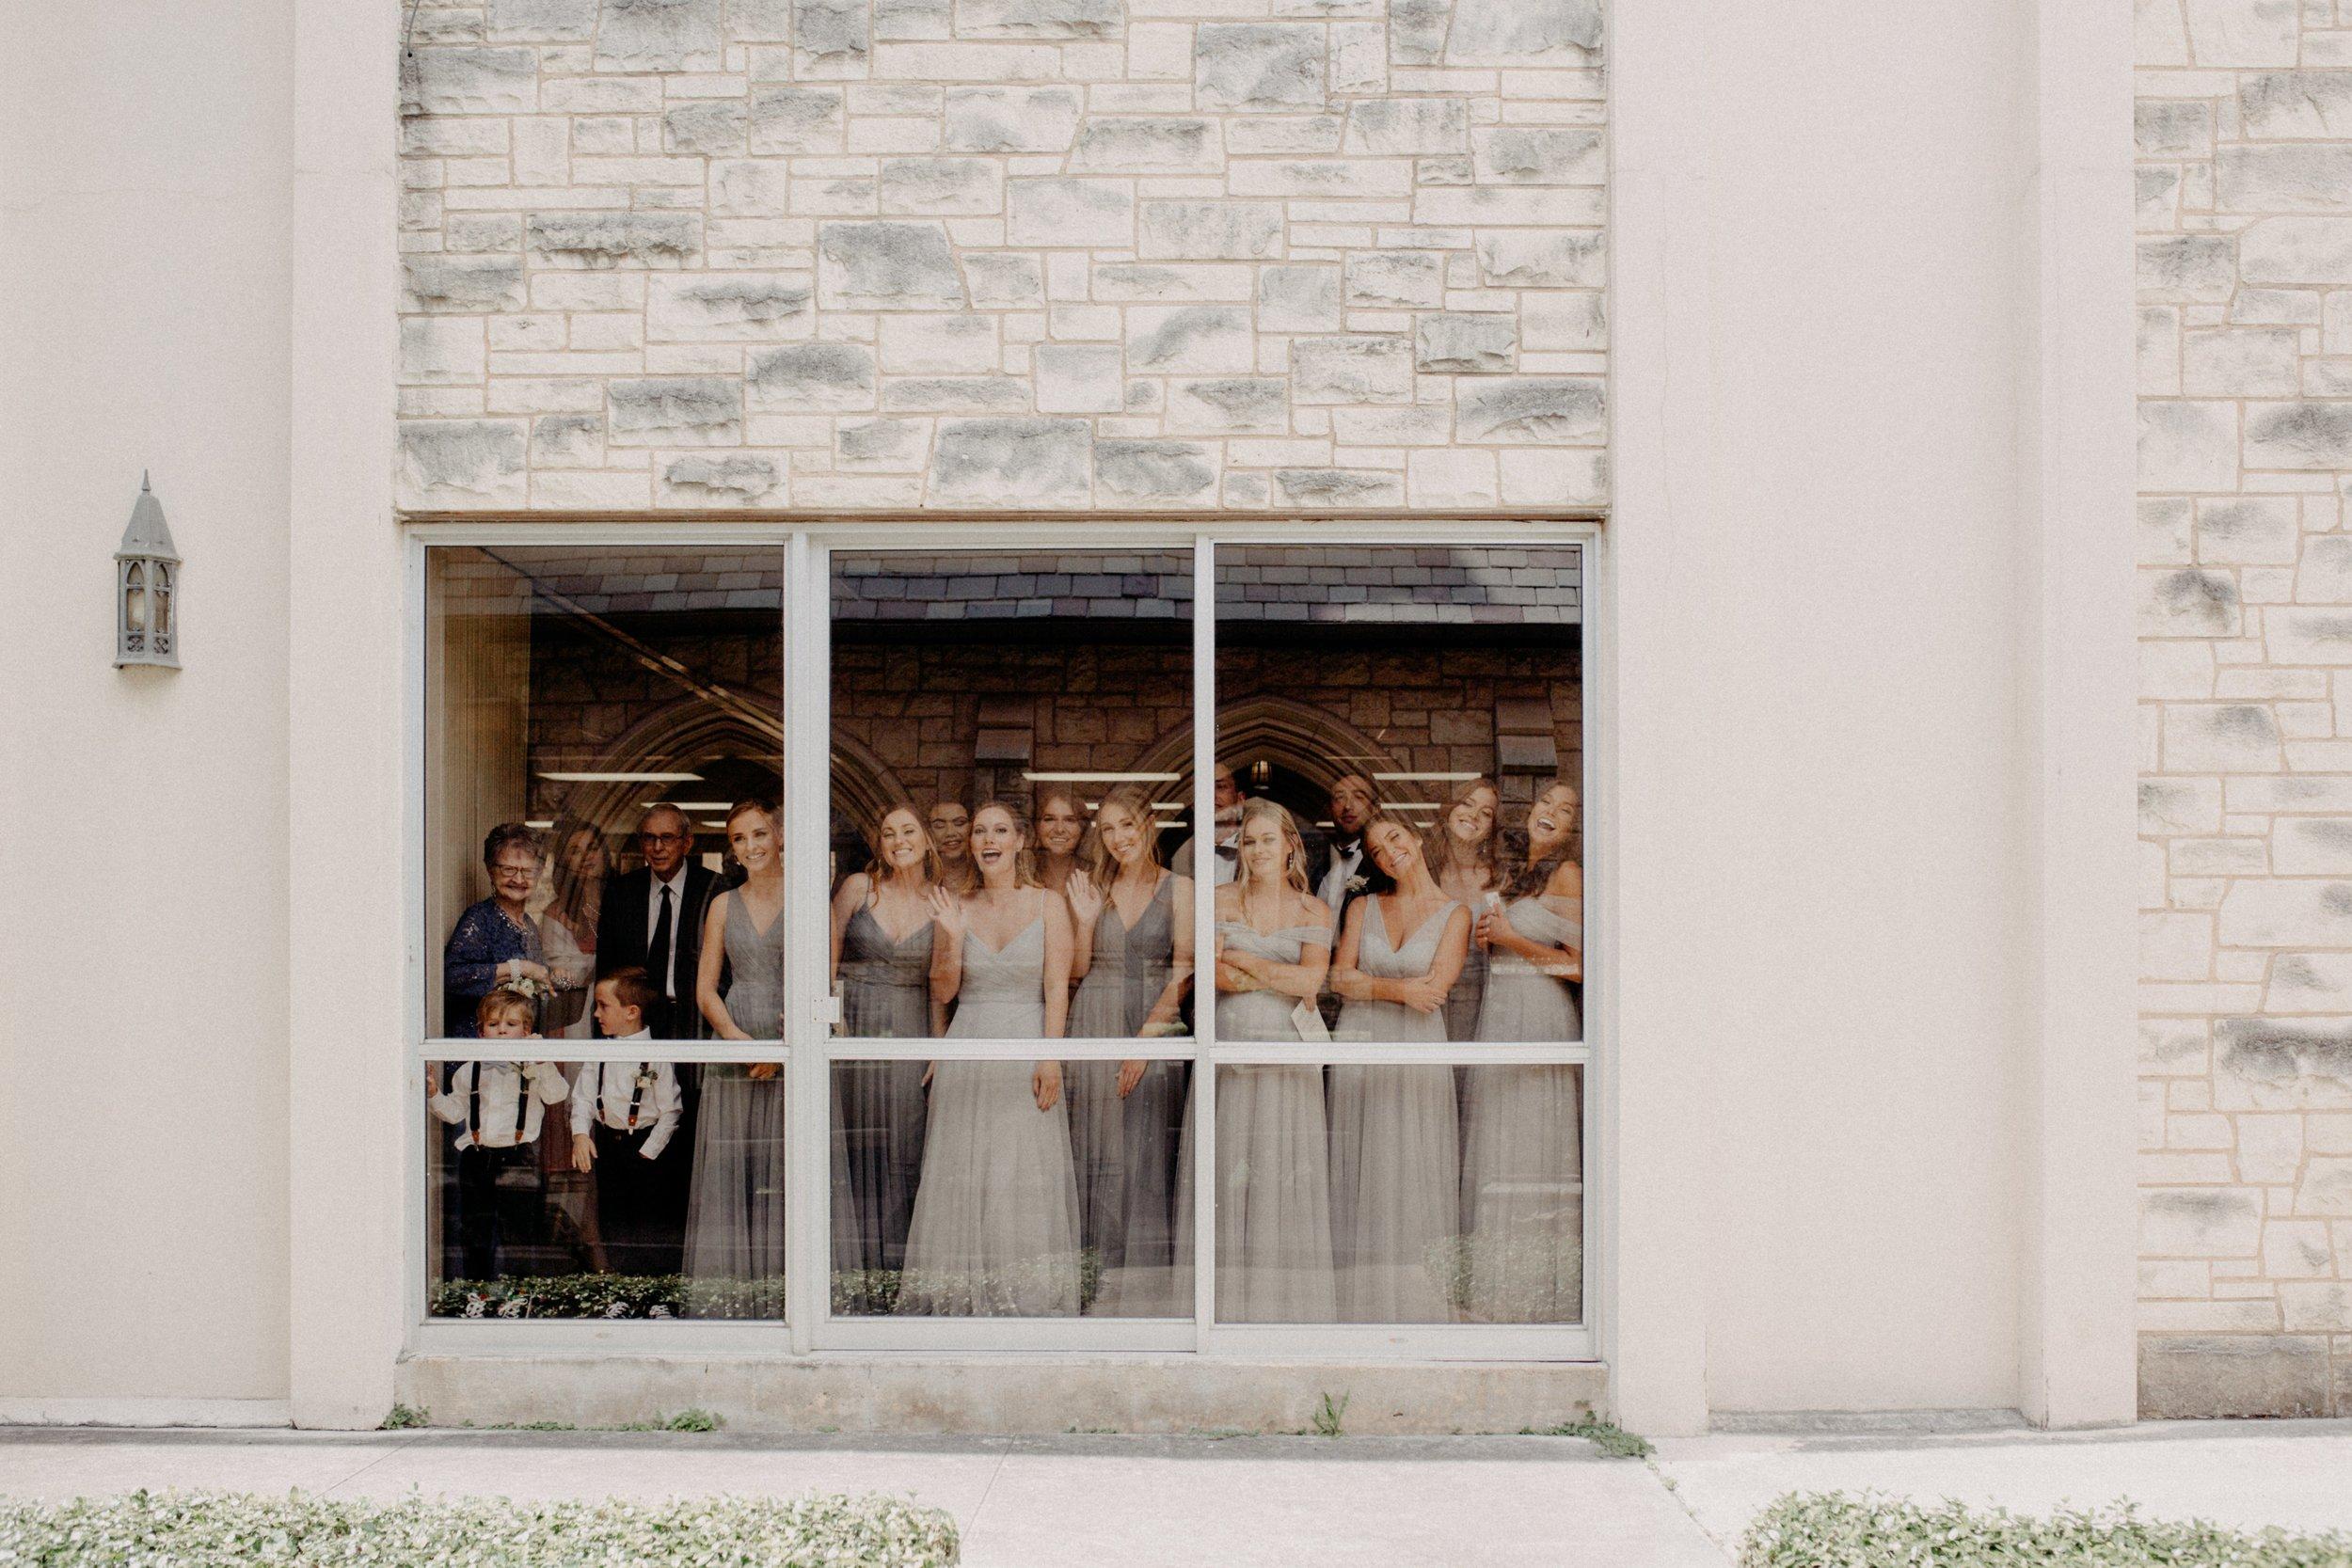 st-anthony-hotel-wedding-photography-10052san-antonio.JPG